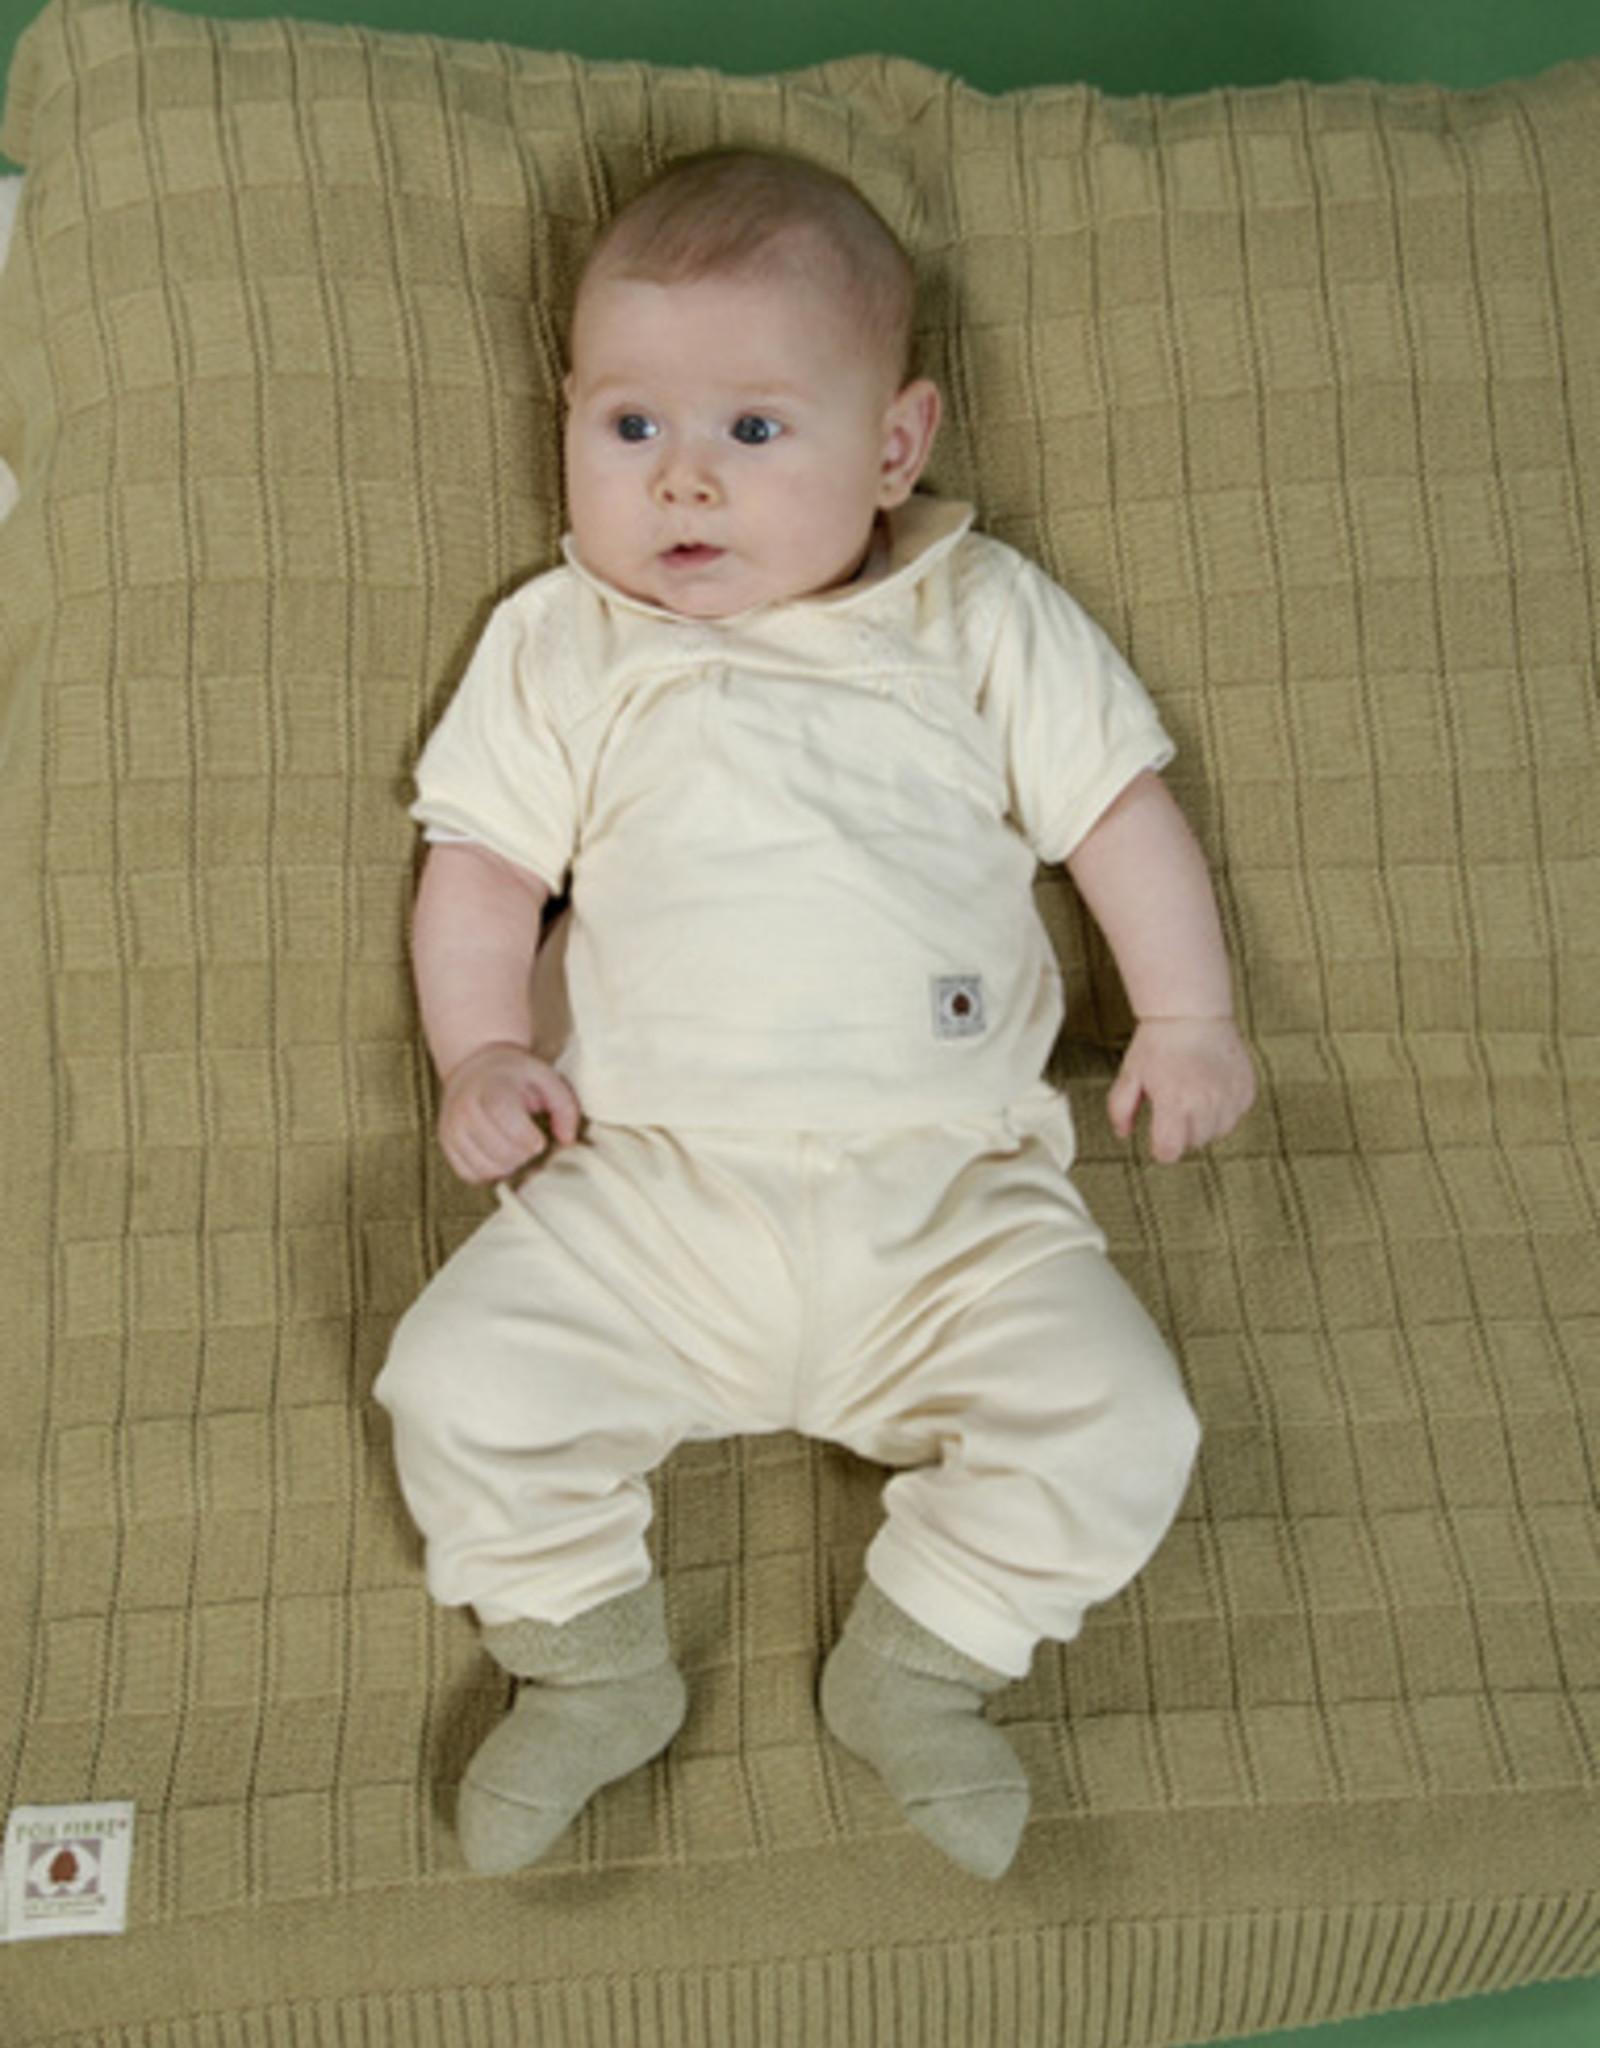 Blusa bebé canesú manga corta. Tallas 12, 18, 24 meses.